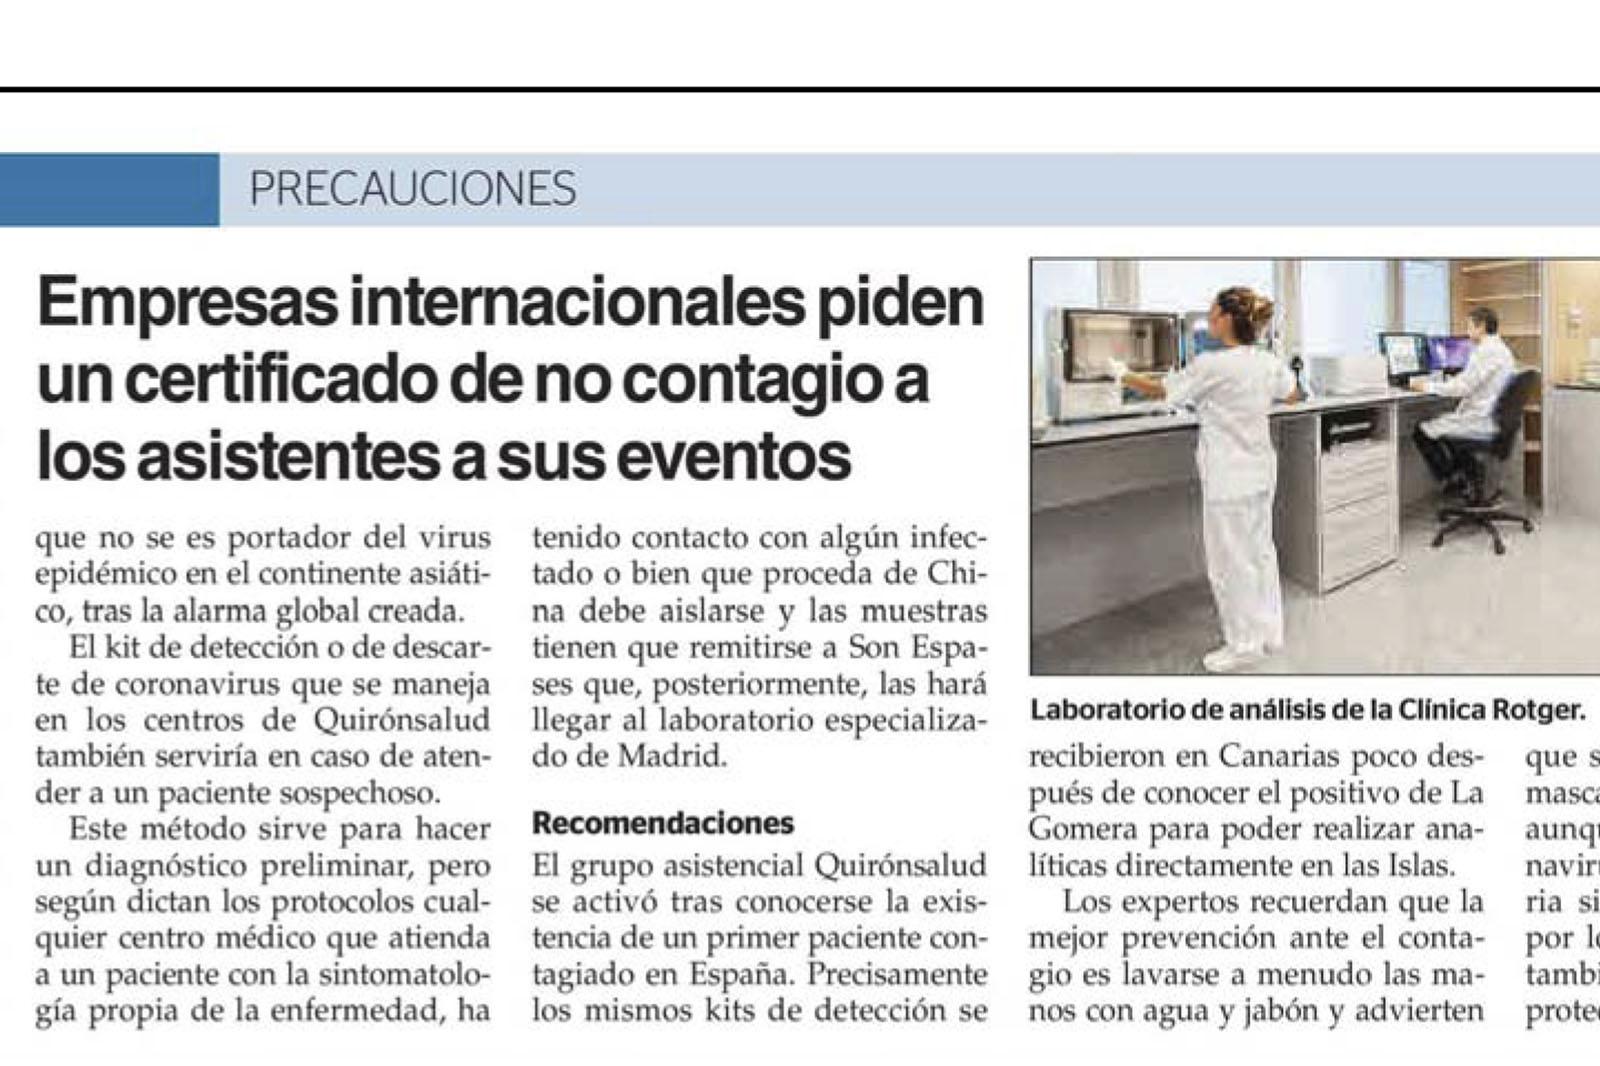 II-Deteccion-Coronavirus-Wuhan-Covid-19-Clinica-Rotger-Hospital-Mallorca